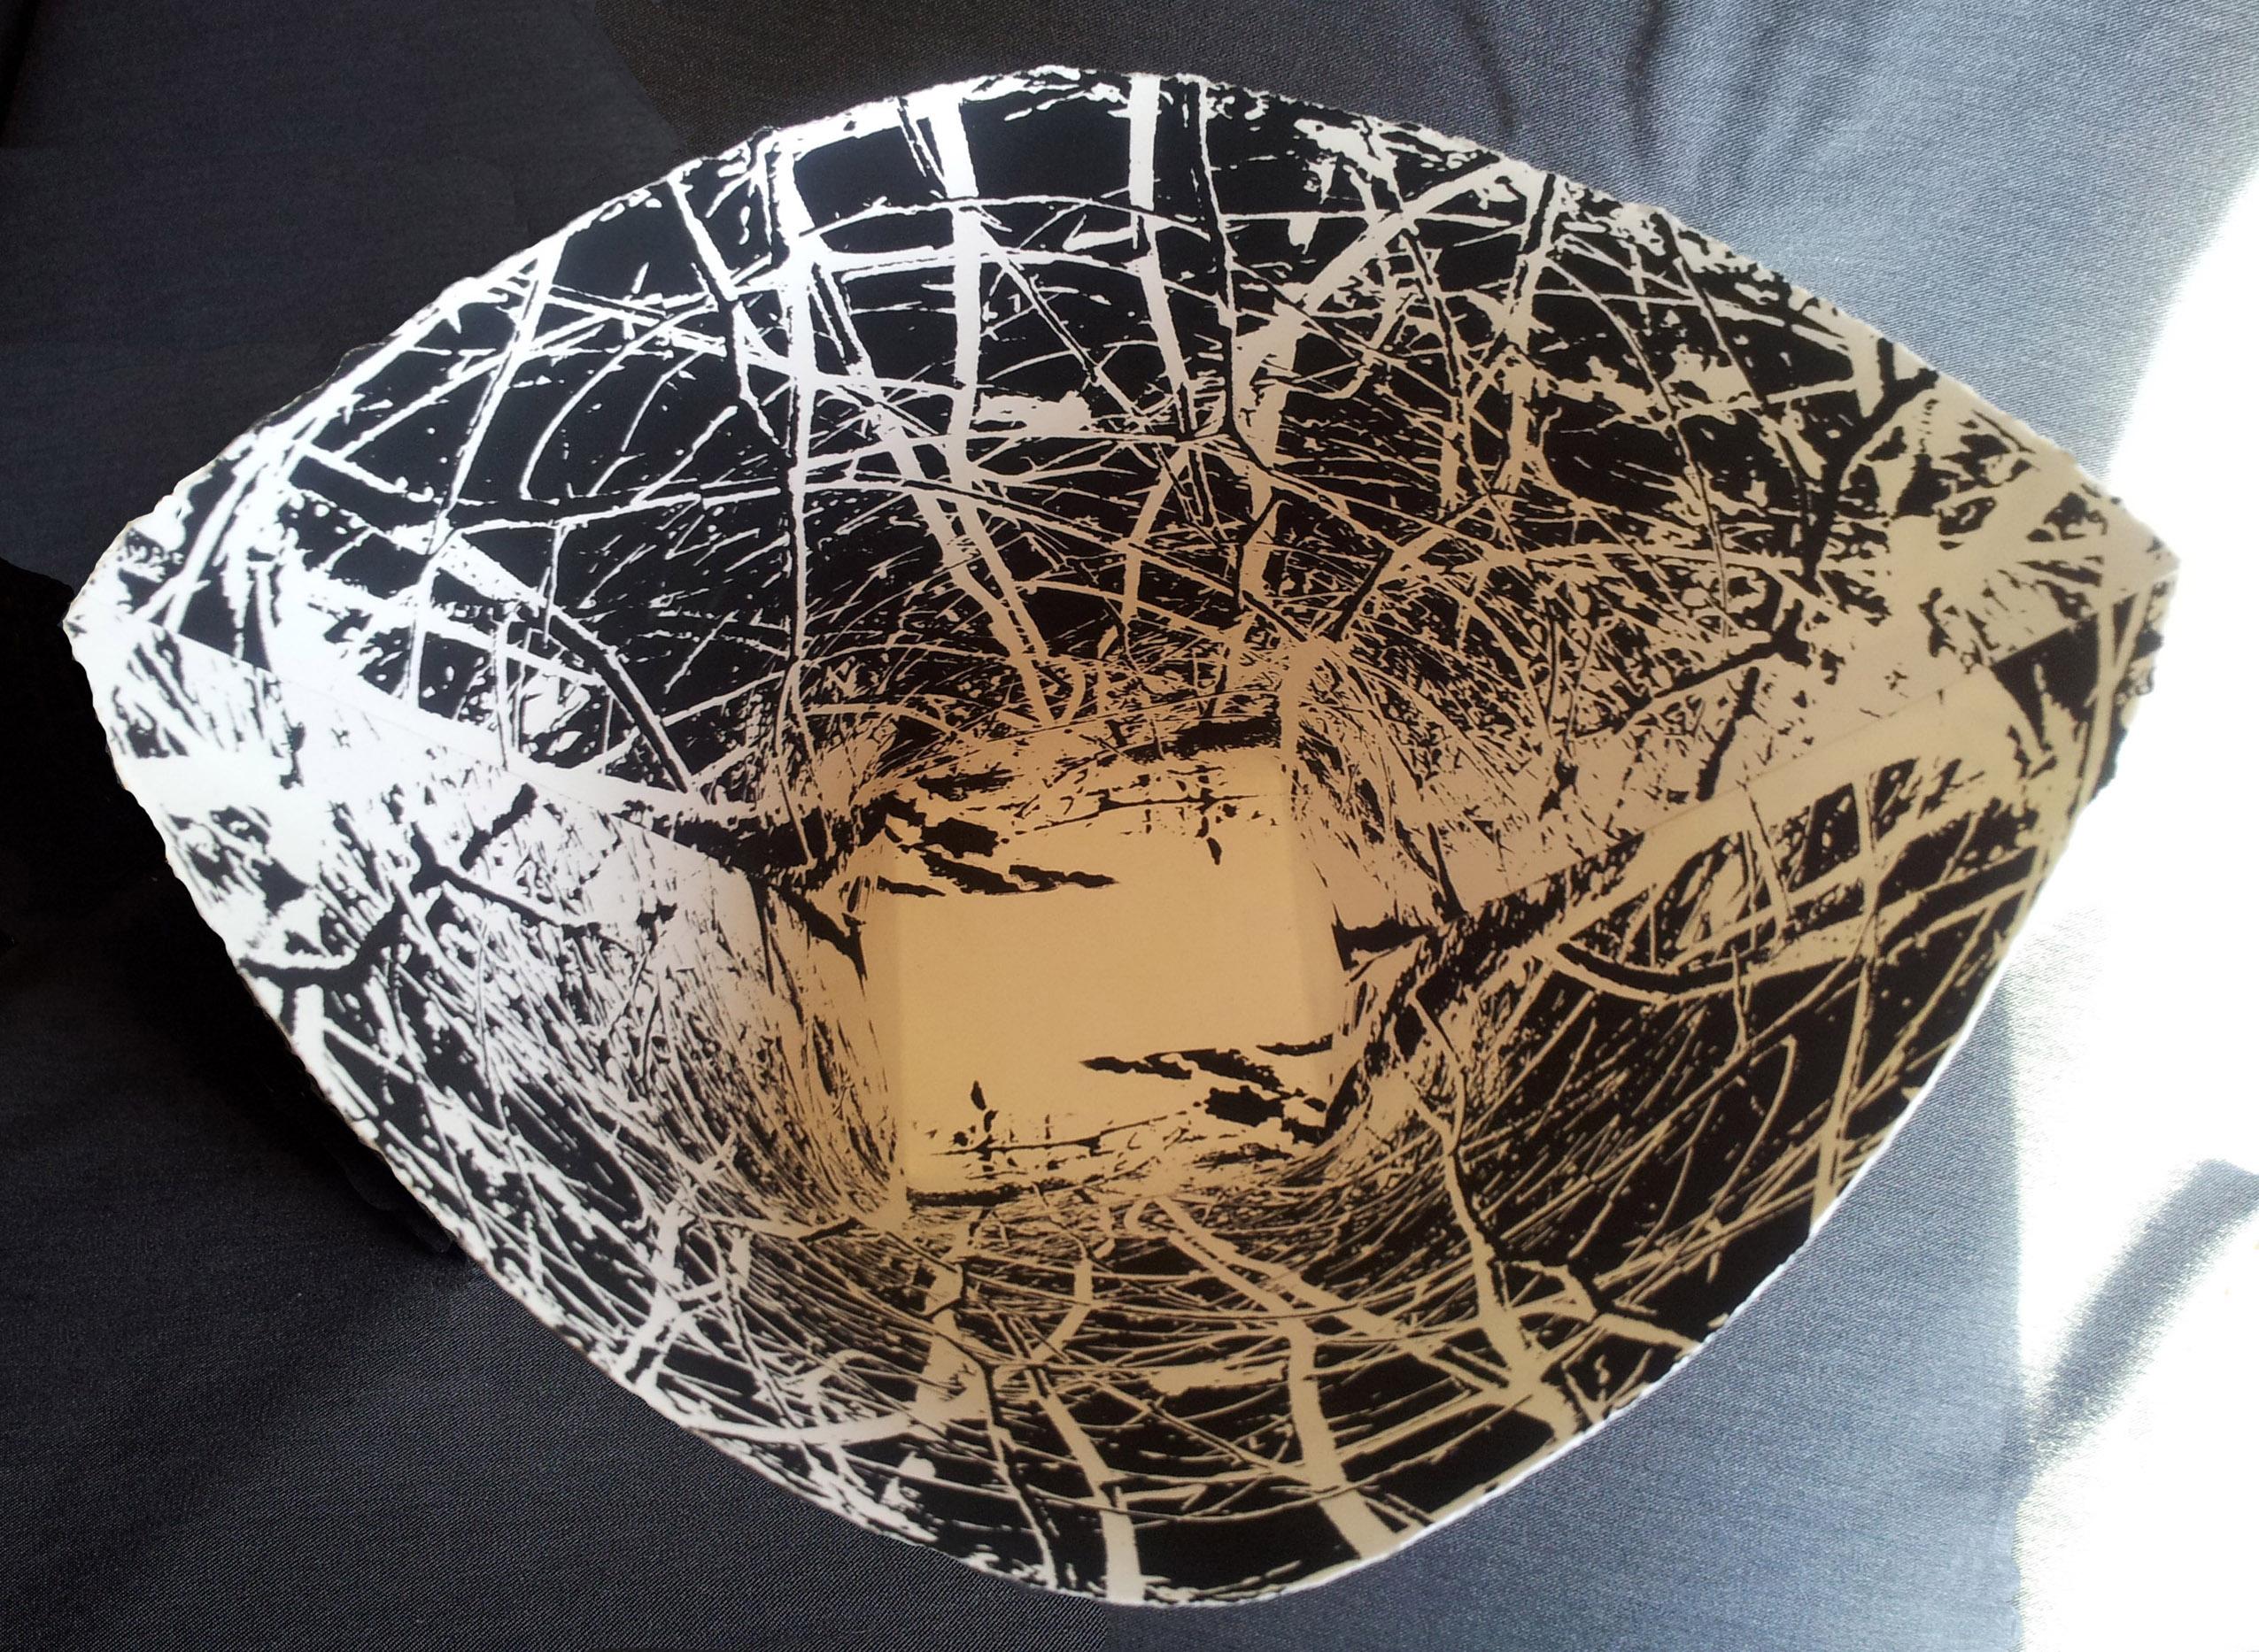 Interior of Cottonwood/Nest Basket